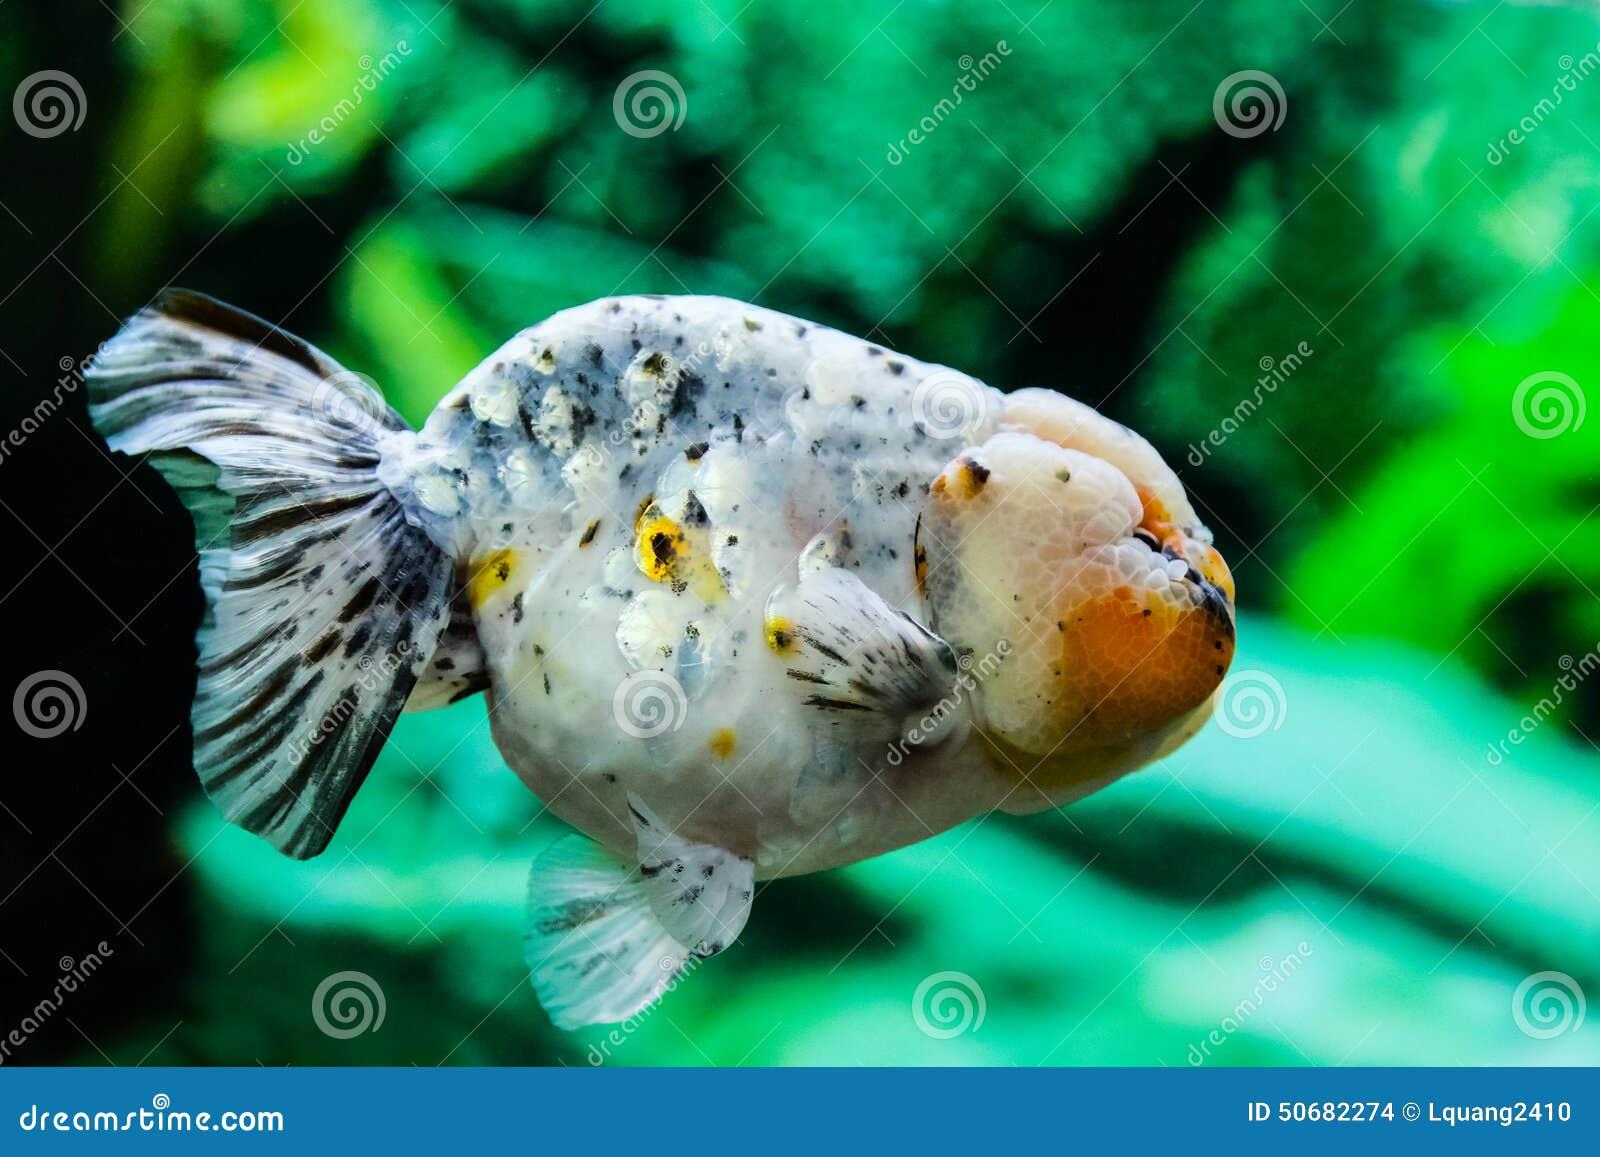 Download 关闭在水族馆的金鱼 库存照片. 图片 包括有 绿色, 背包, 自由, 水族馆, 关闭, 红色, 宠物, 敌意 - 50682274